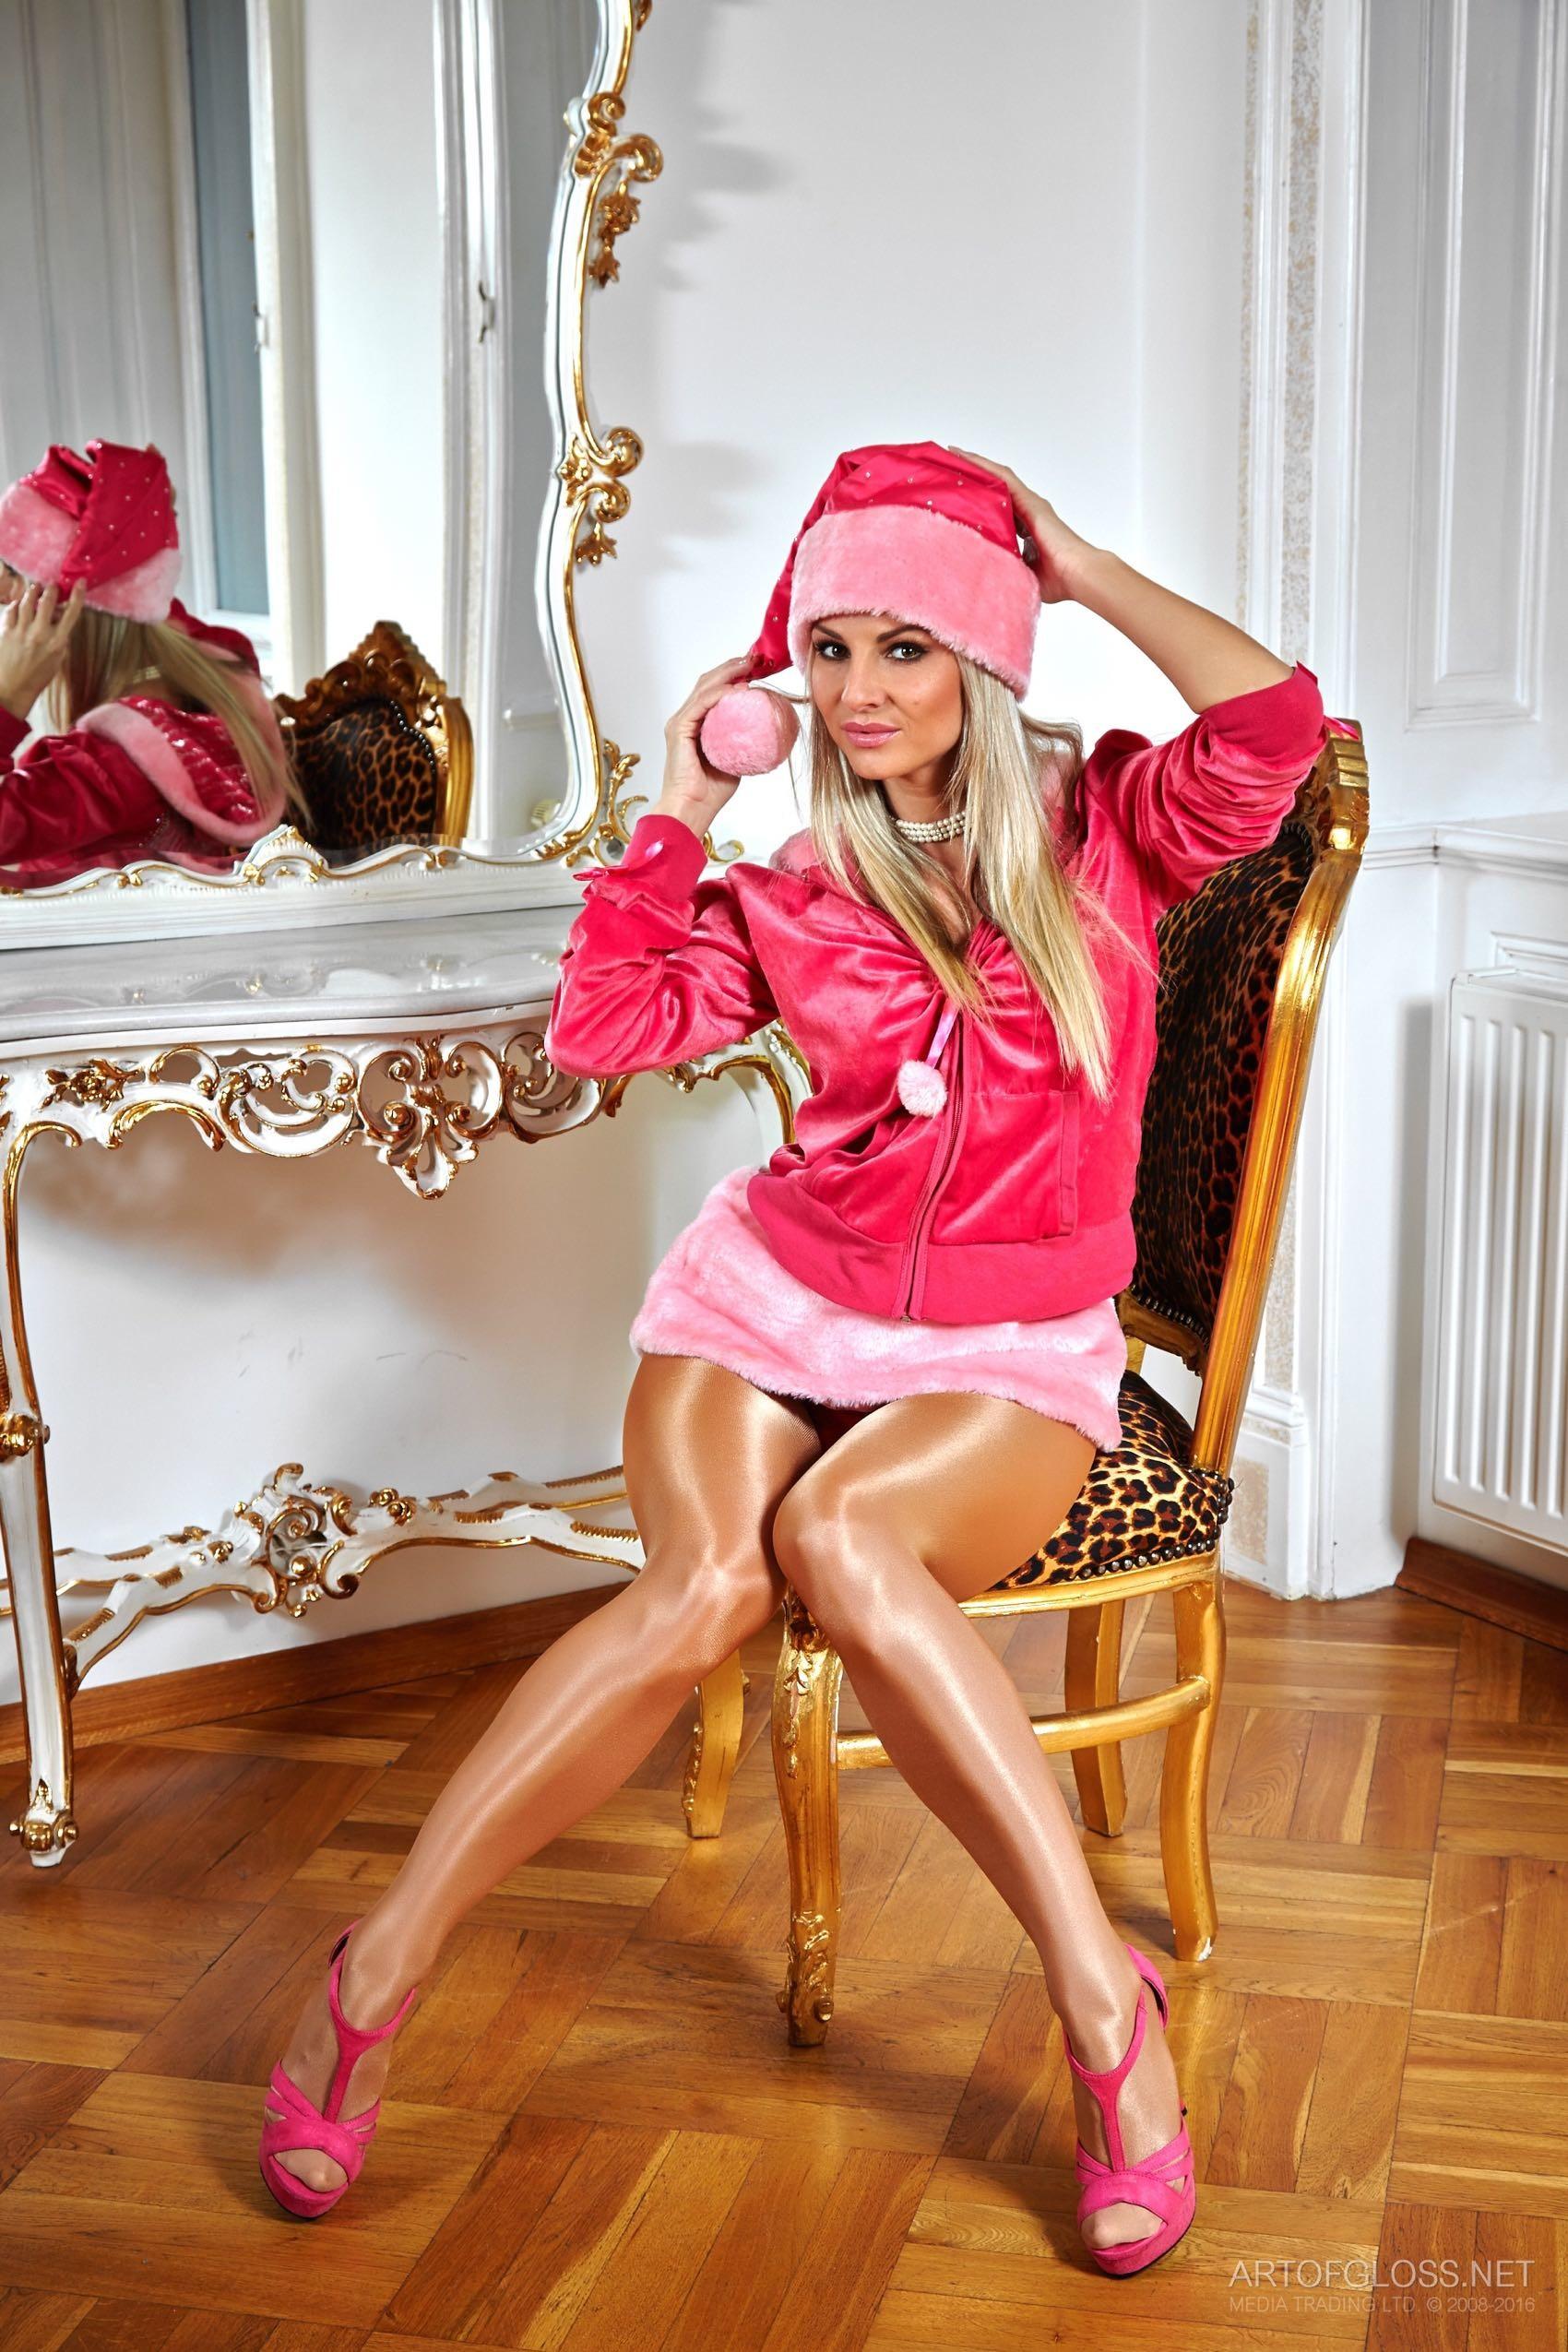 porno-s-blondinkami-v-atlase-modeli-erotika-chelyabinsk